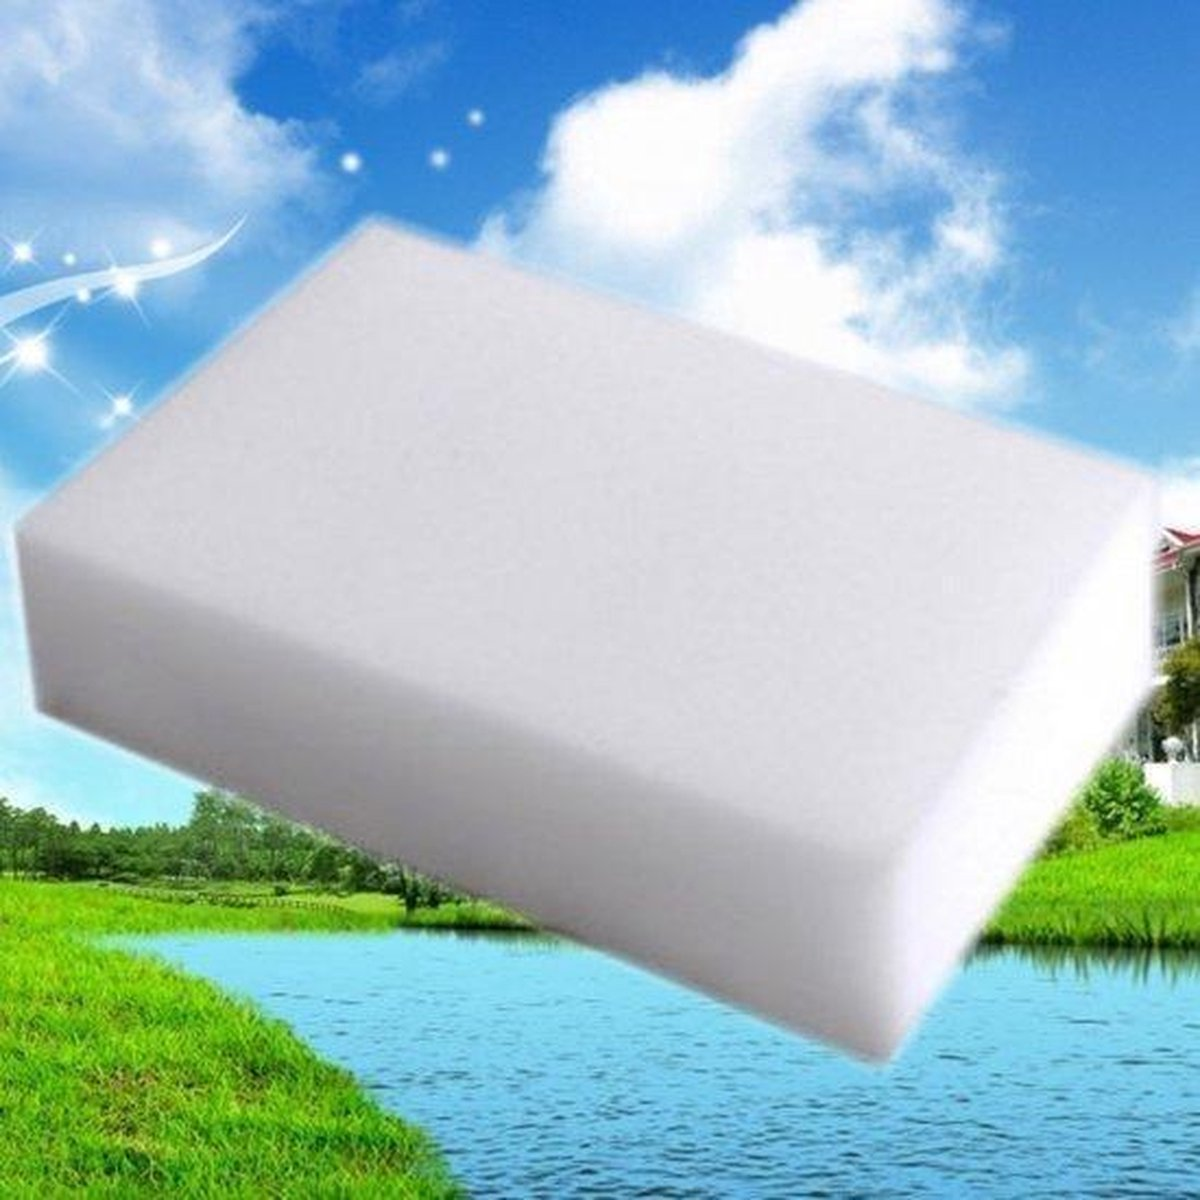 150x Wonderspons Schoonmaakspons - Melamine Spons - Magic Sponge kopen